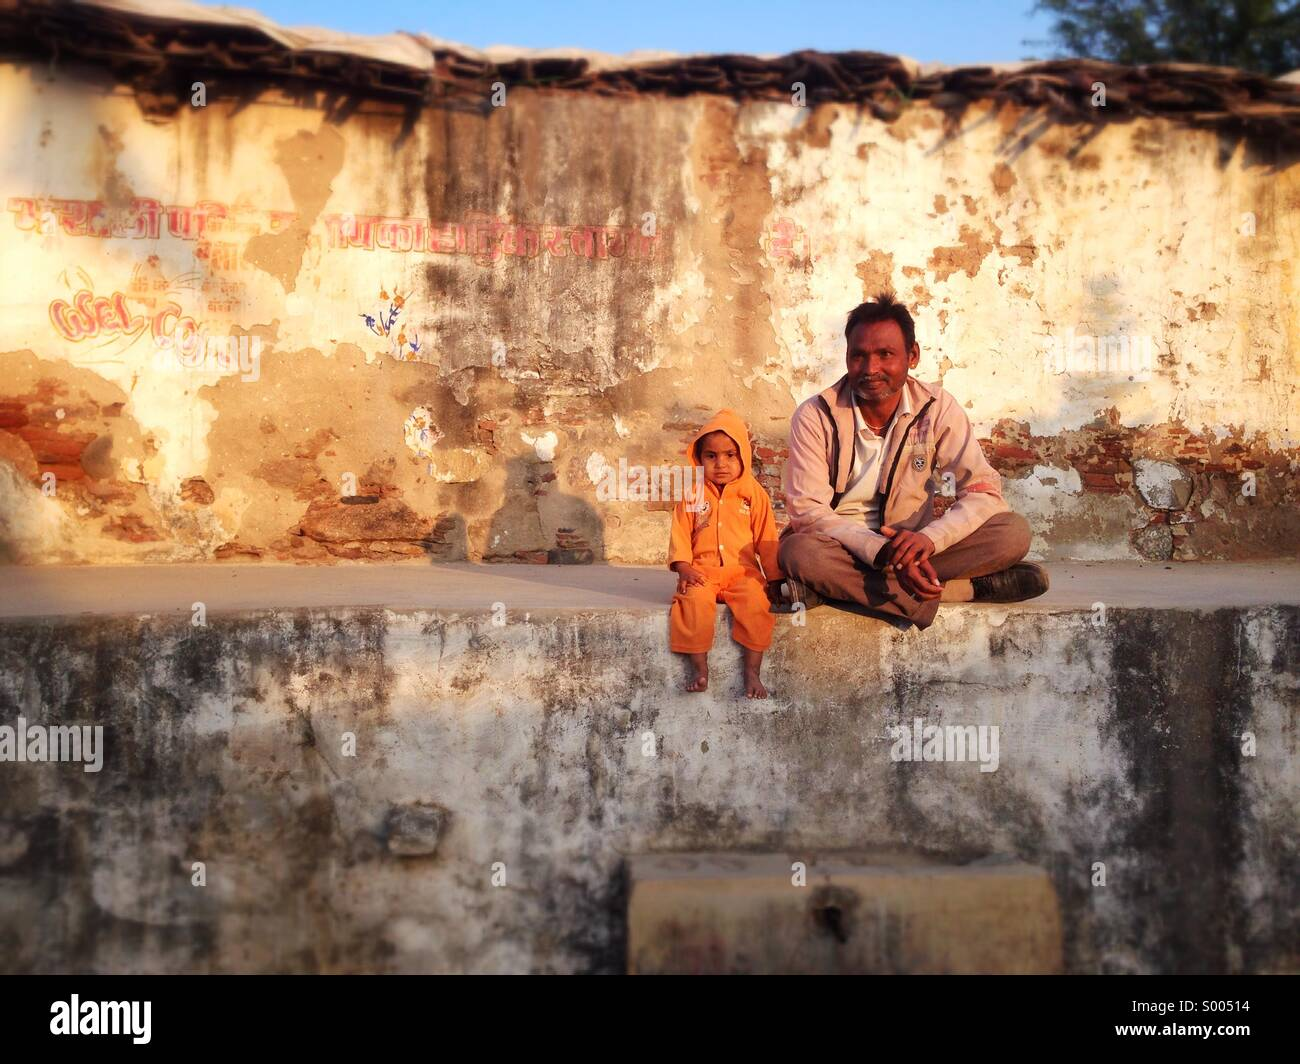 Homme et enfant, Narlai, Rajasthan. Photo Stock